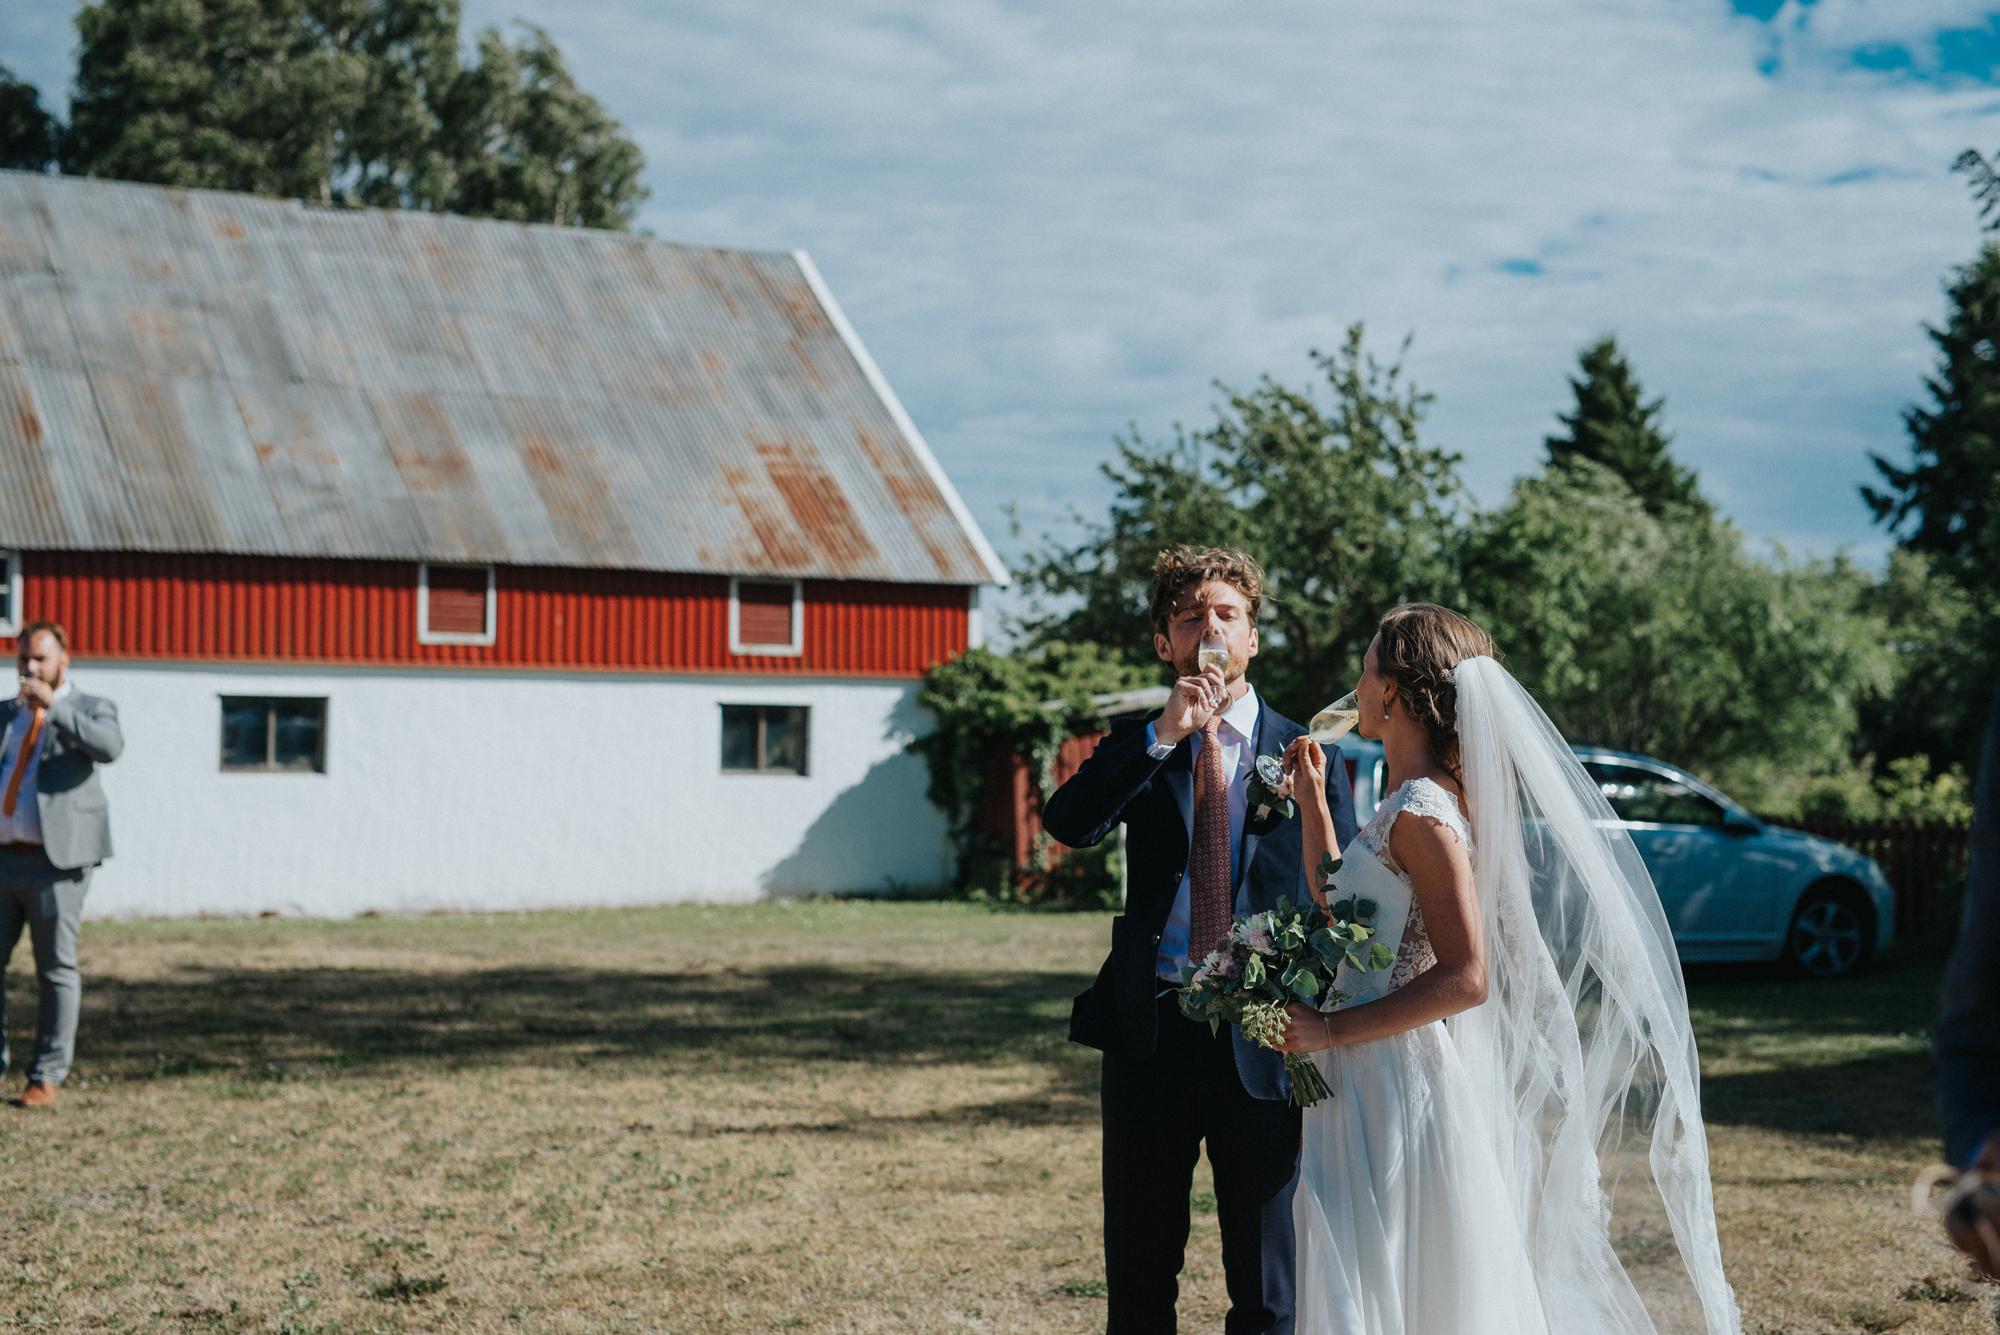 023-bröllop-hemma-hos-ulrika-gotland-neas-fotografi.jpg